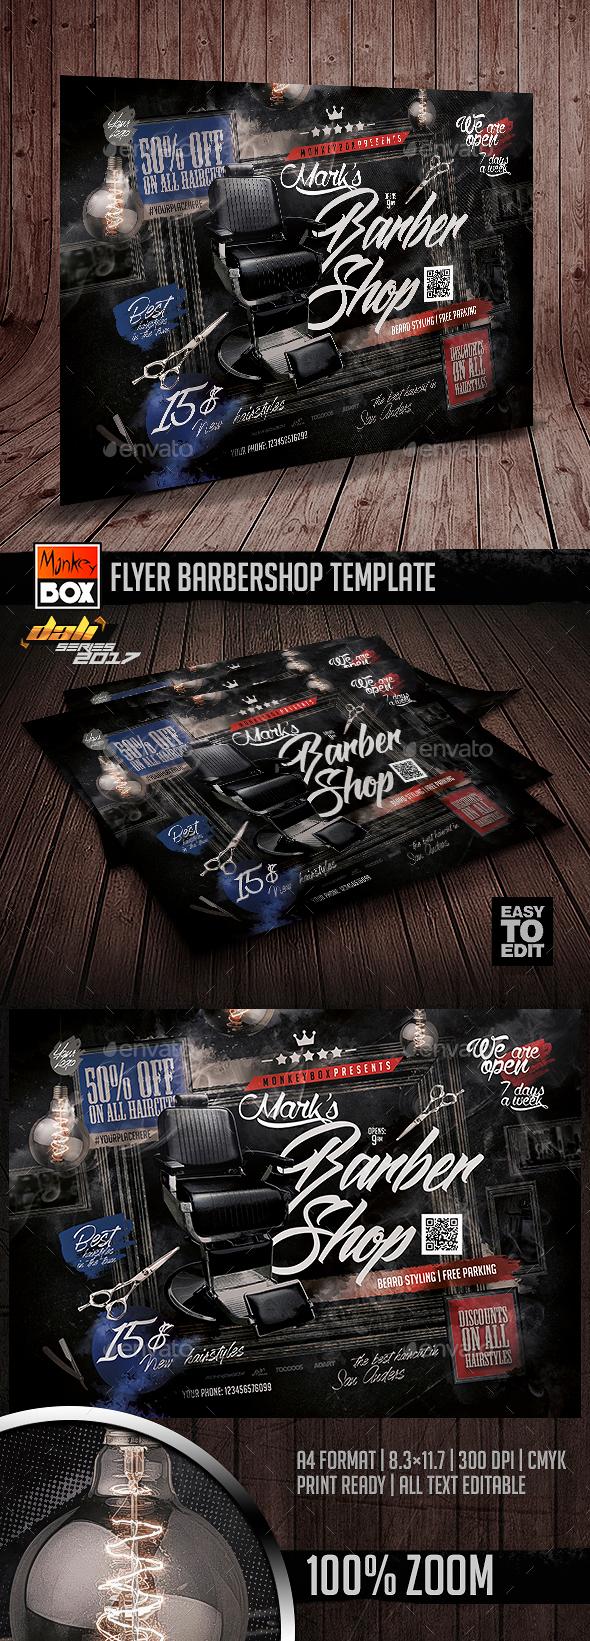 Flyer Barbershop Template - Flyers Print Templates